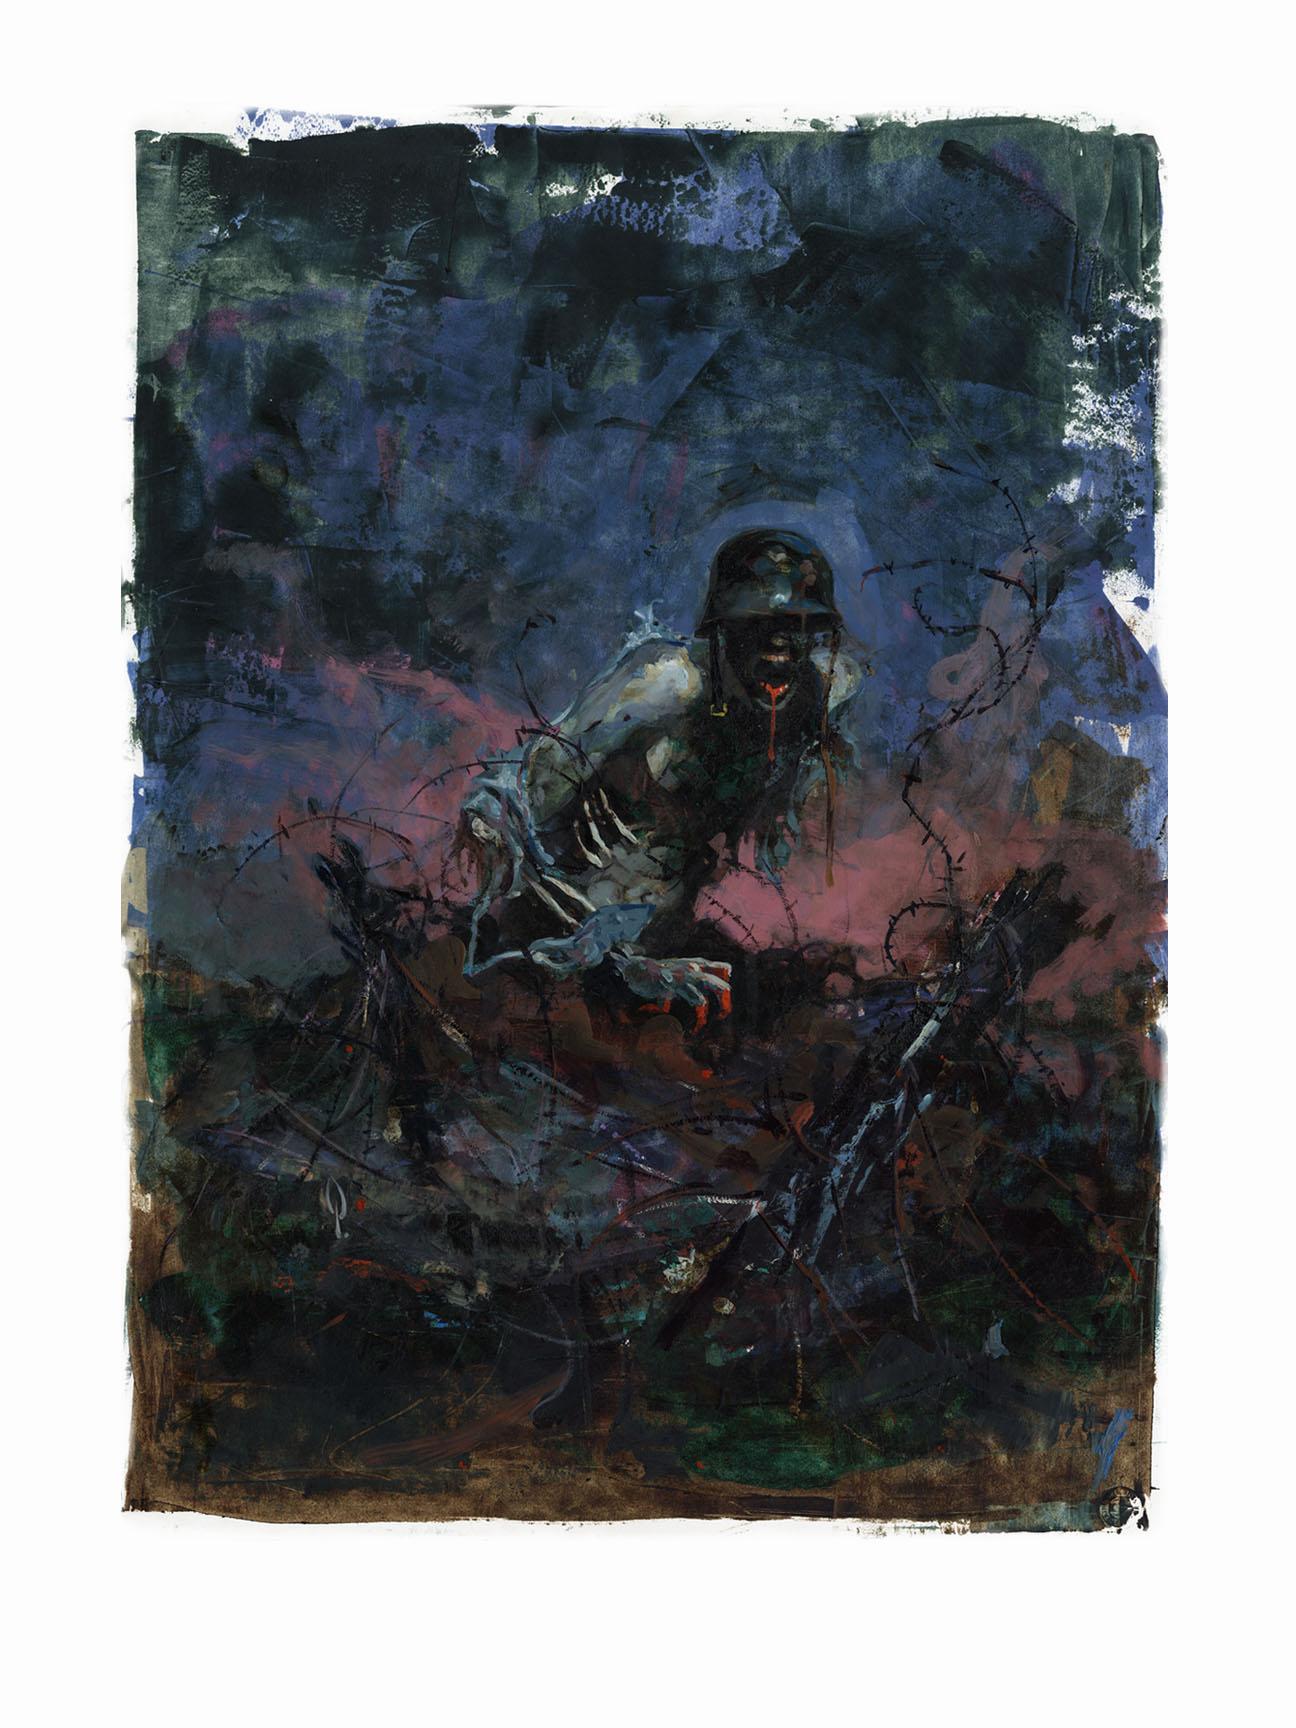 FINE ART PRINT Cover Art By George Pratt 17 X 22